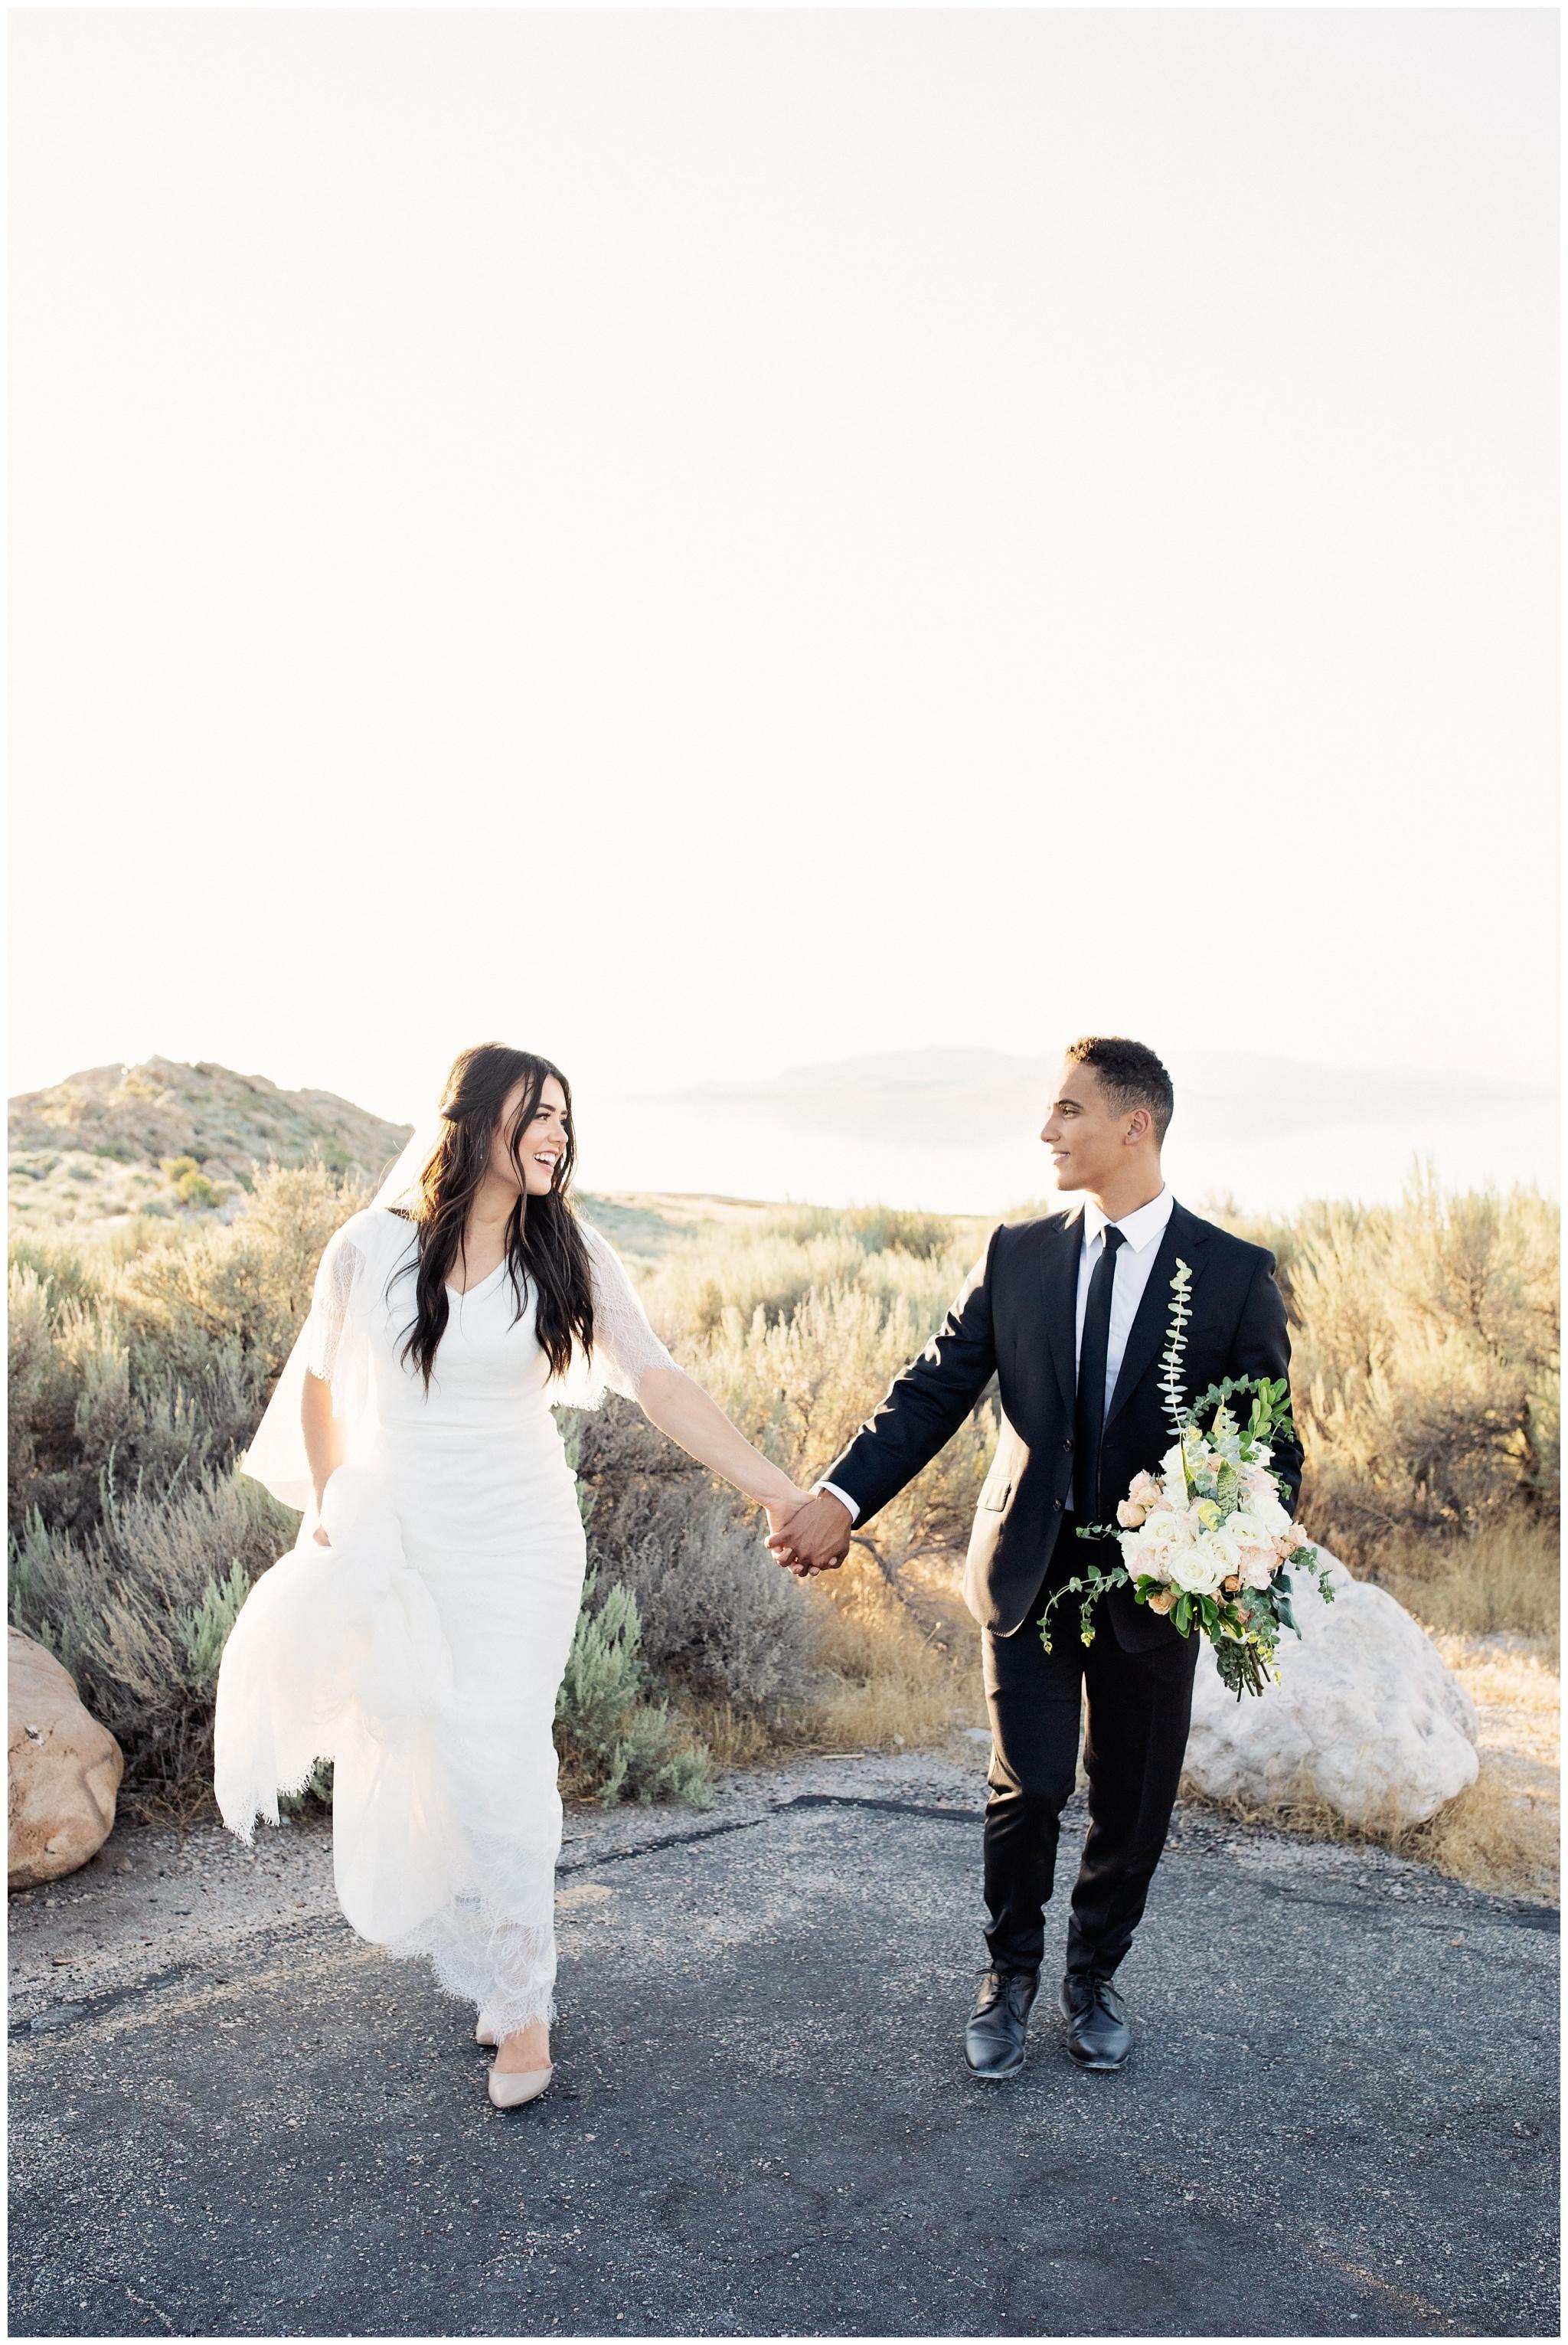 Bride and Groom running towards wedding photographer at Antelope Island